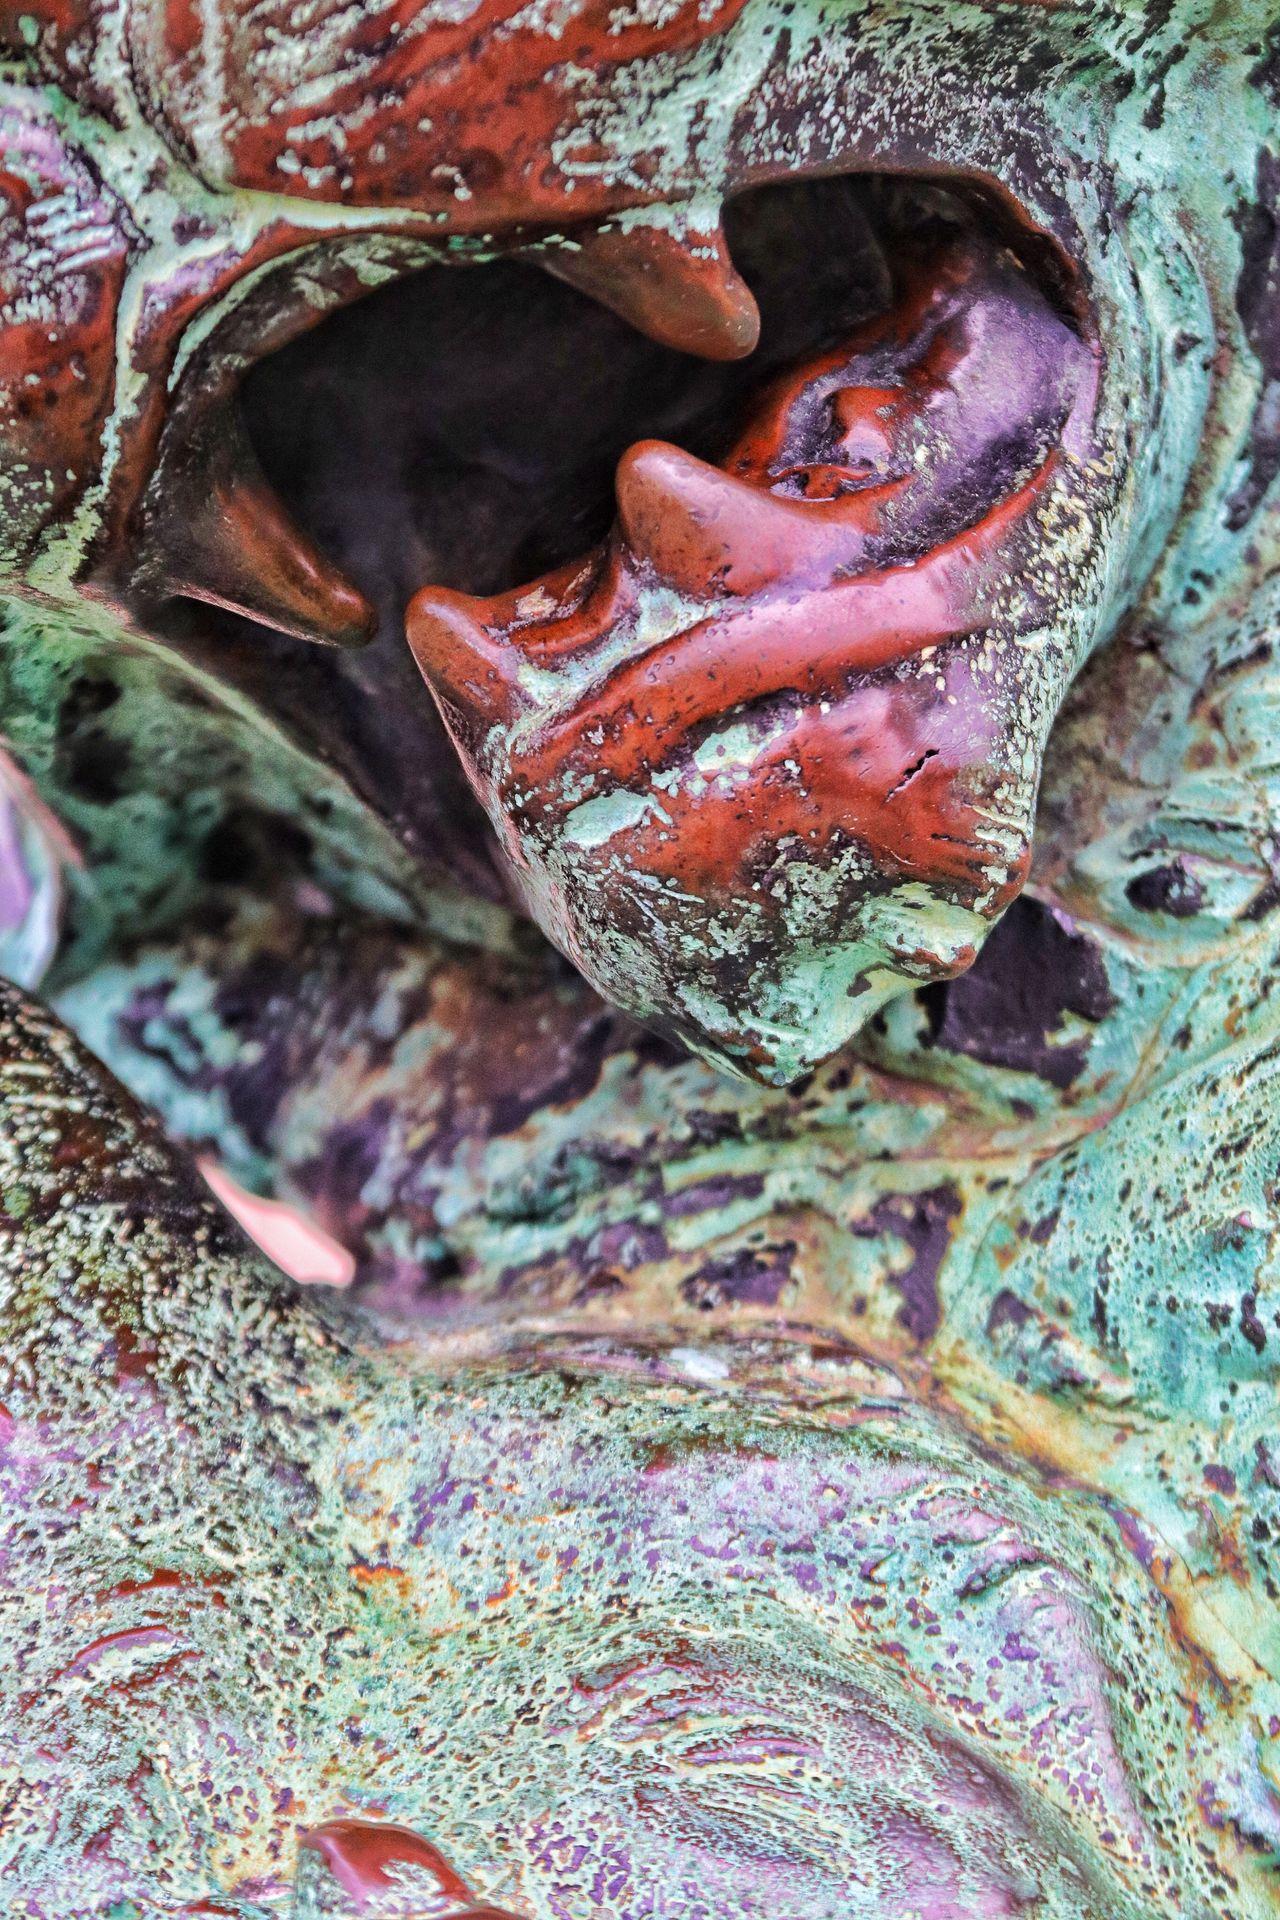 Fangs Teeth Lion Sculpture Sculpture Copper Art Copper  Elements Of Nature Degradation Erosion Effects Eroded